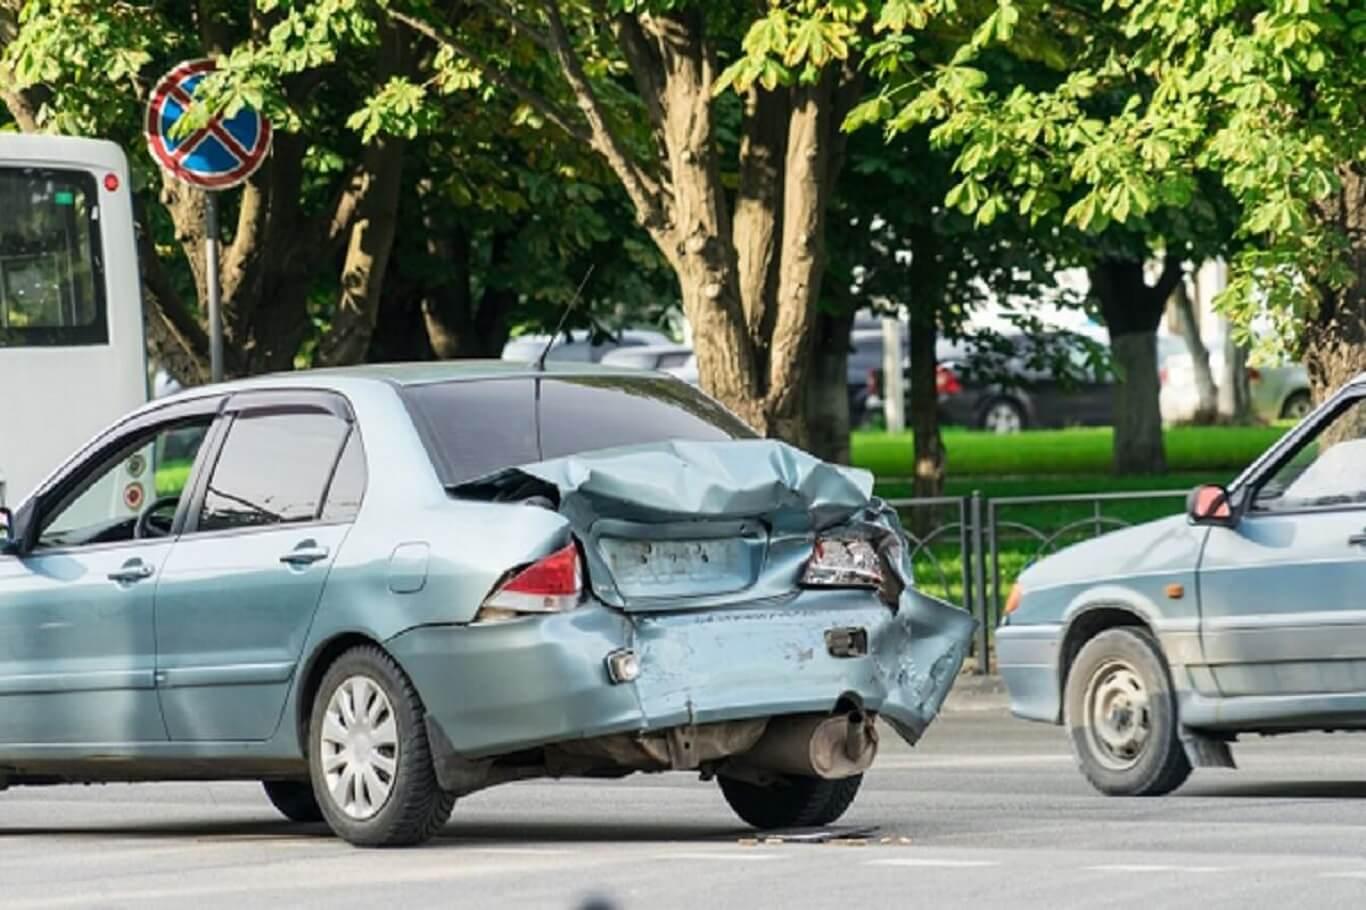 car accident scenarios who's fault